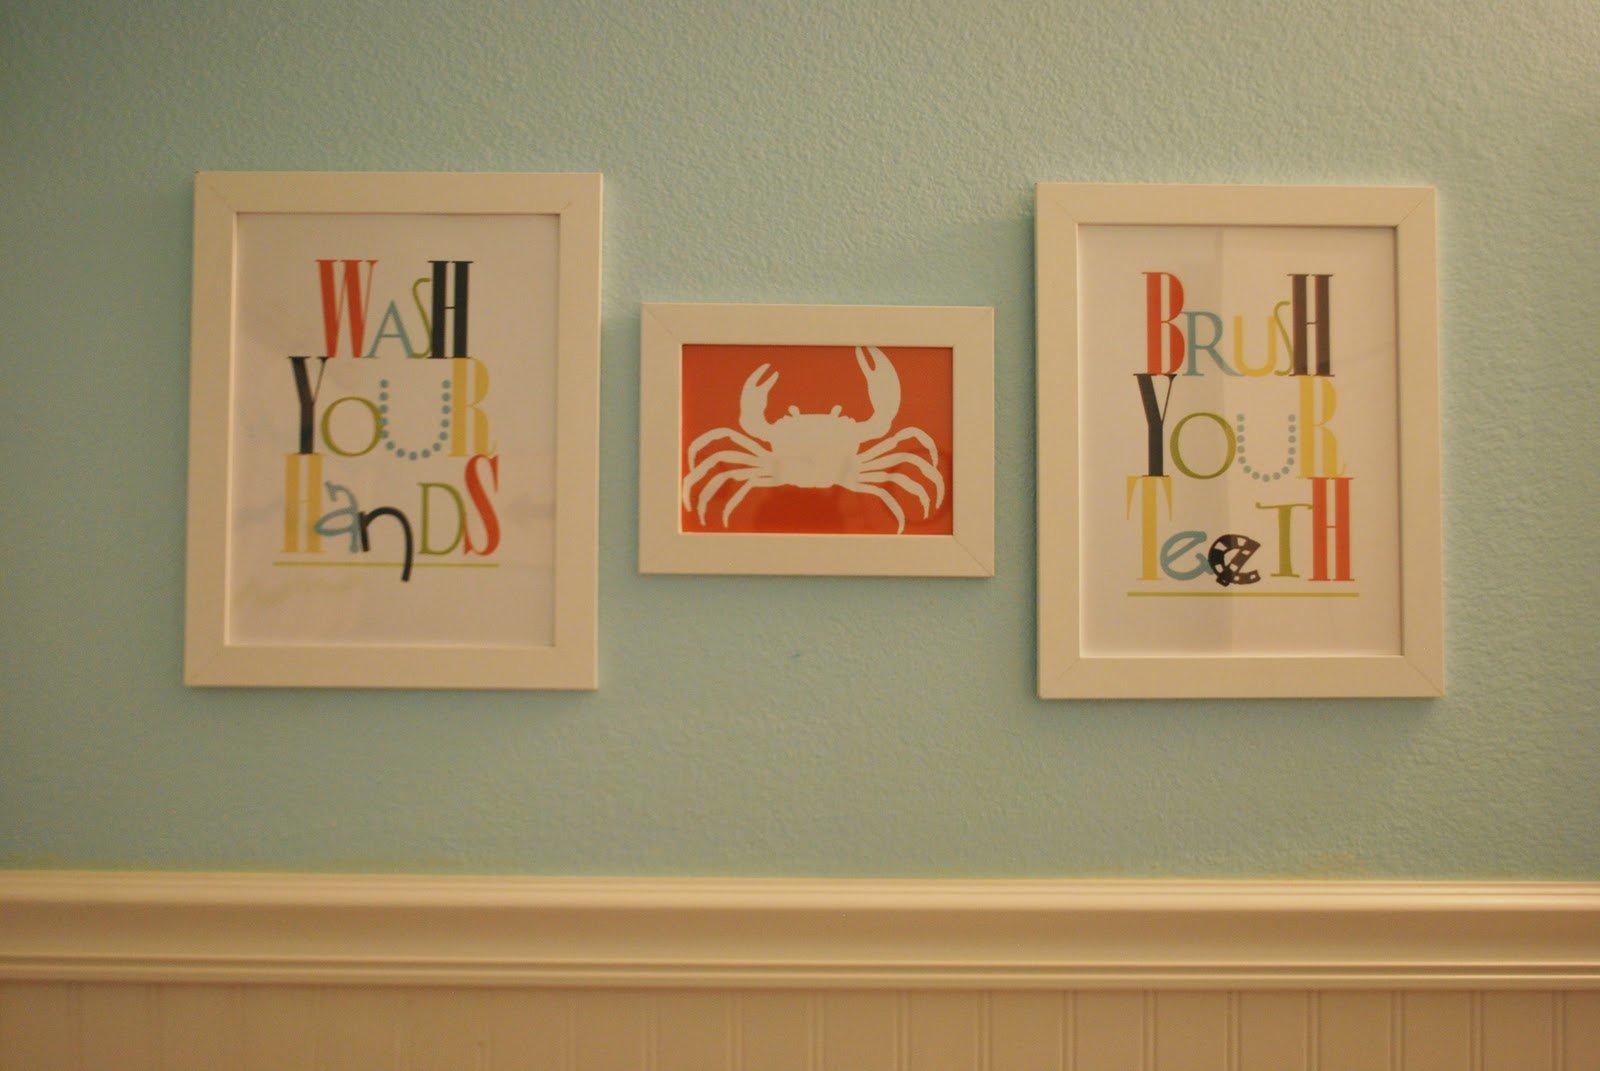 Bathroom wall art printables - Wash Your Hands Brush Your Teeth Printable Signs